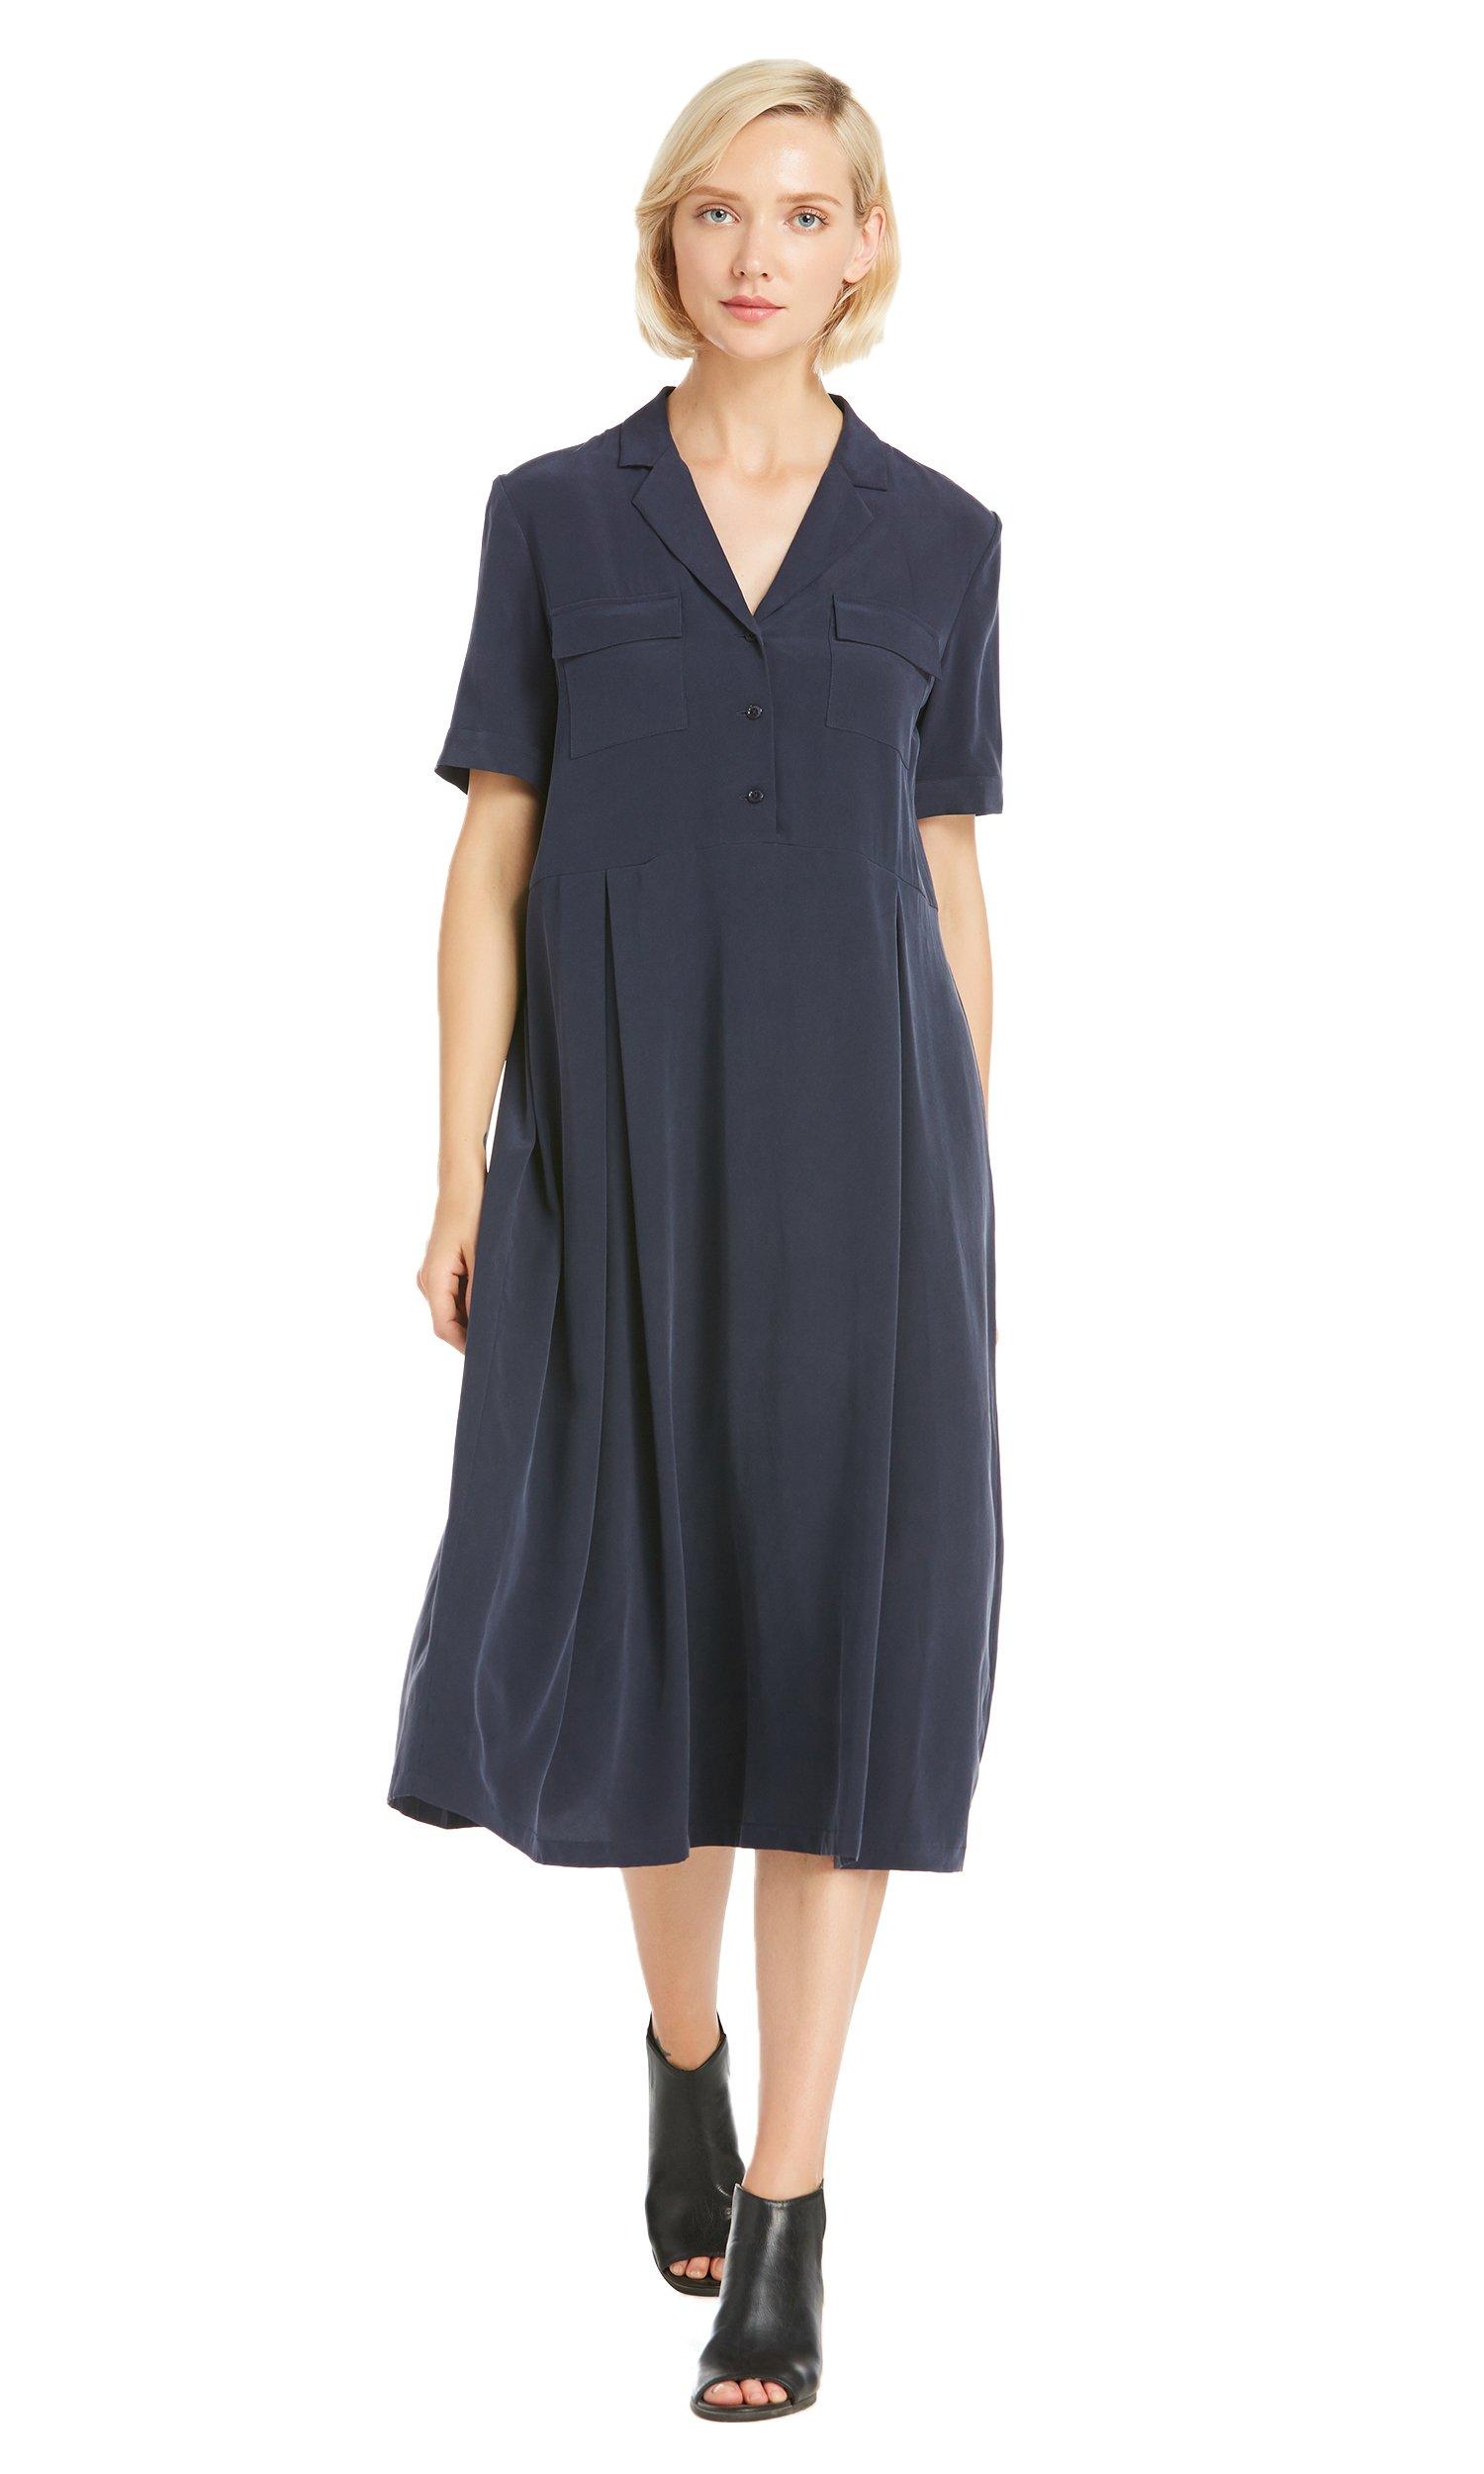 LILYSILK Womens Silk Shirt Dress Pure Mulberry 23MM Notched Collar Formal Work Office Lady Business Elegant Designer Navy Blue XXL/18-20 by LilySilk